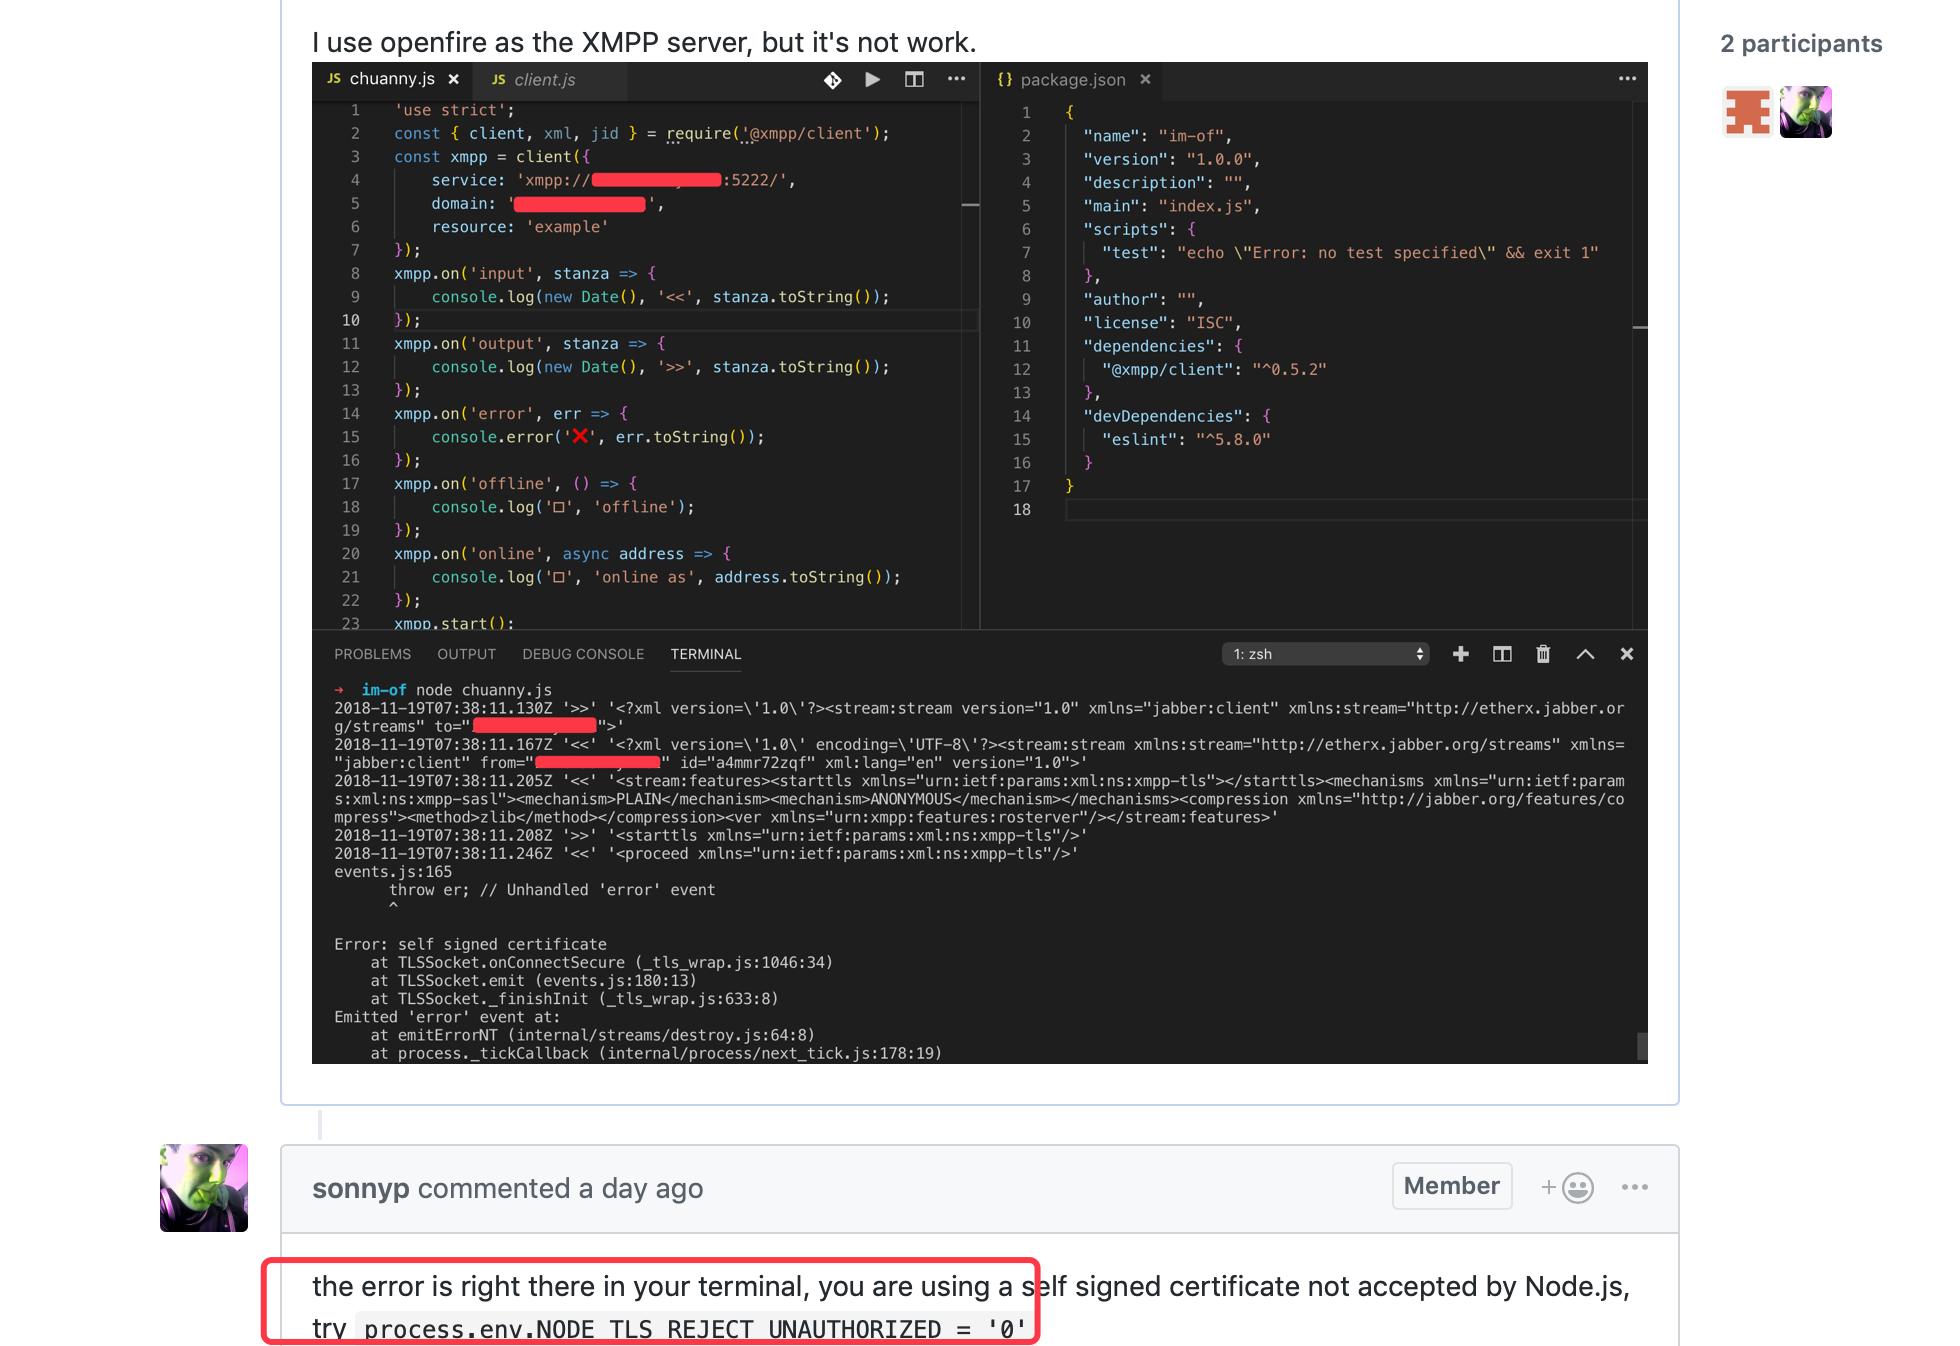 Manual handling SSL Errors eg. On self signed certificates ...